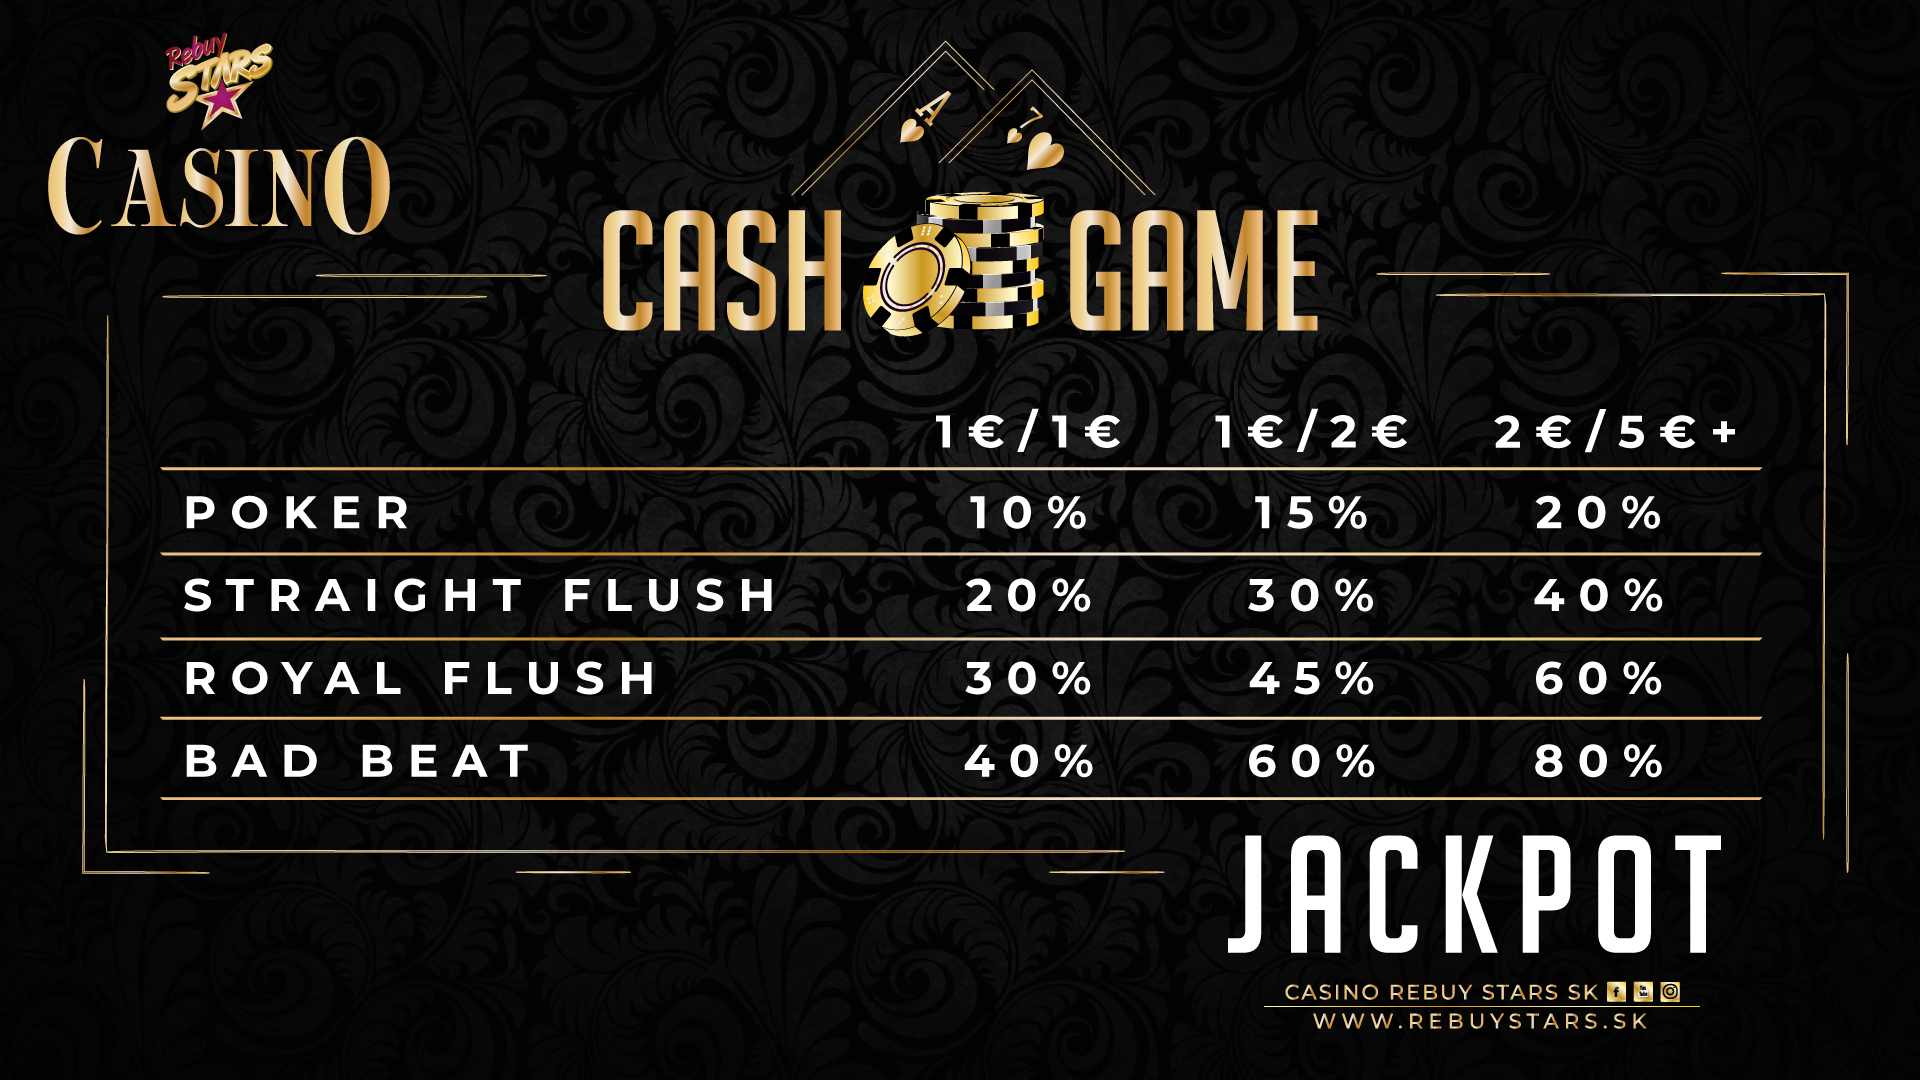 2021_05_09_CASH-GAME-JACKPOT2_1920x1080px